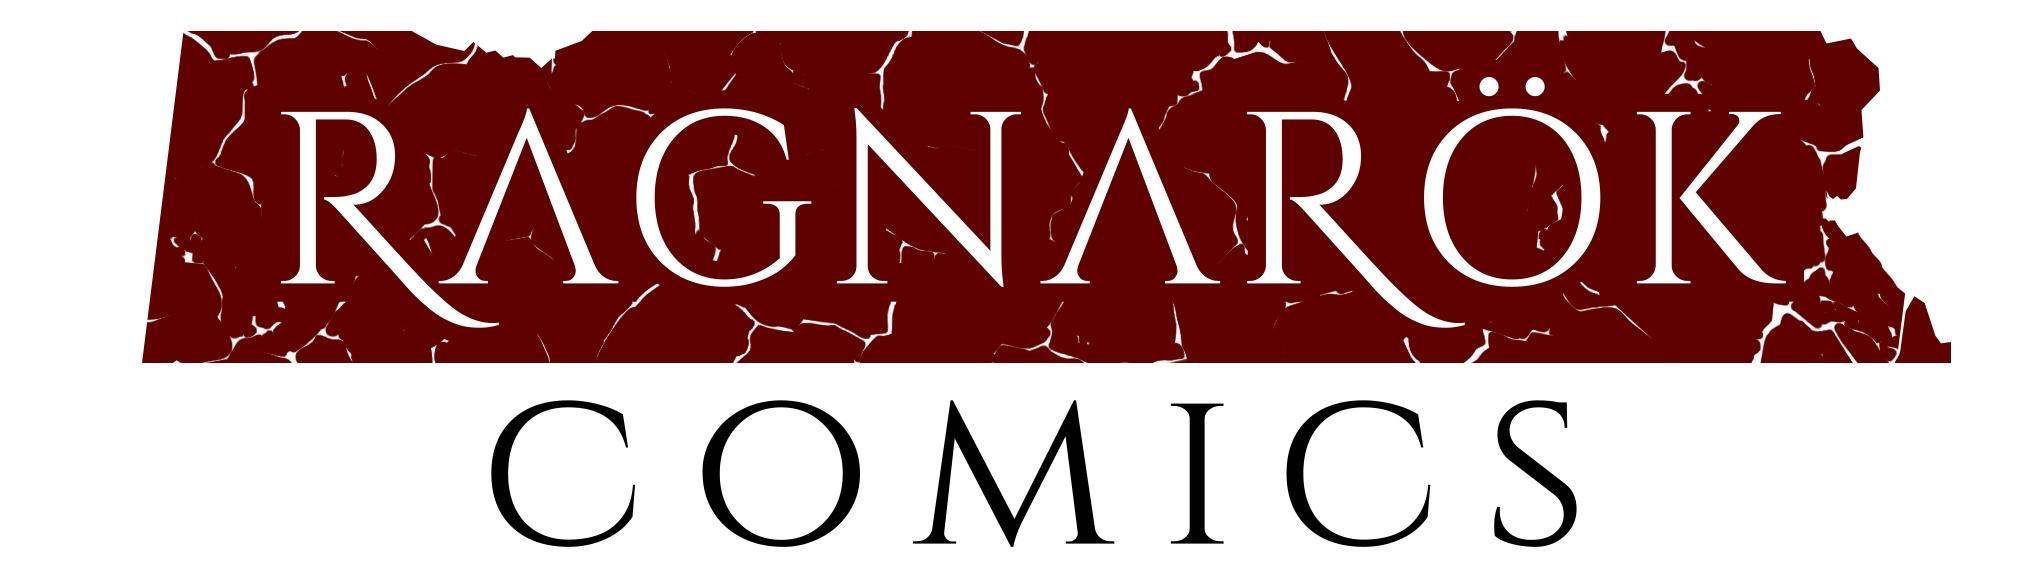 Ragnarok Comics Logo